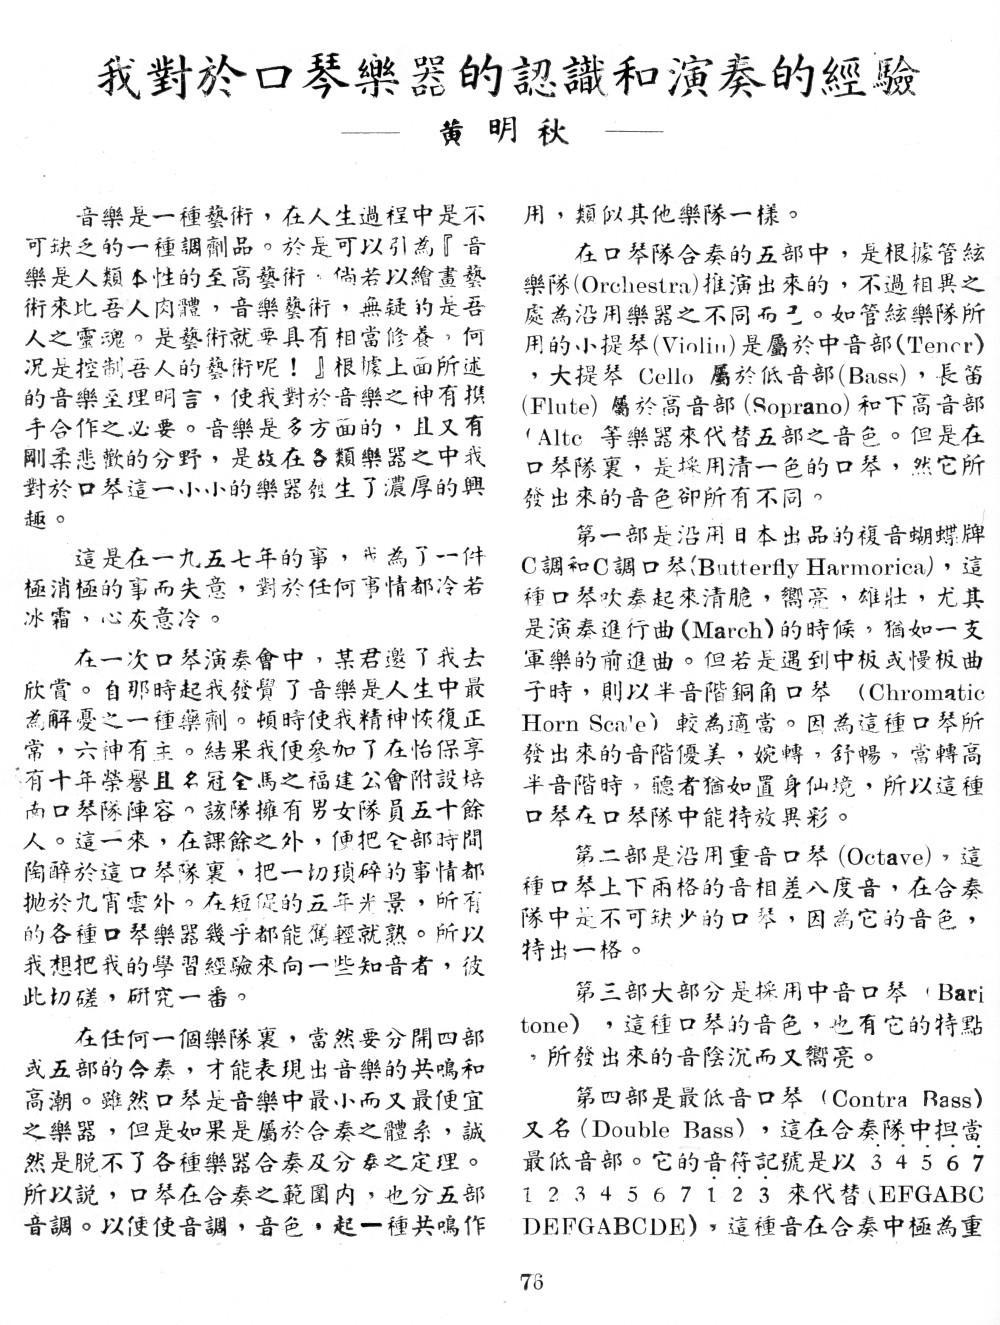 003 Chinese Essay St1961mag 076p Wp Amazing Art Topics Vce Formats Sheet Full